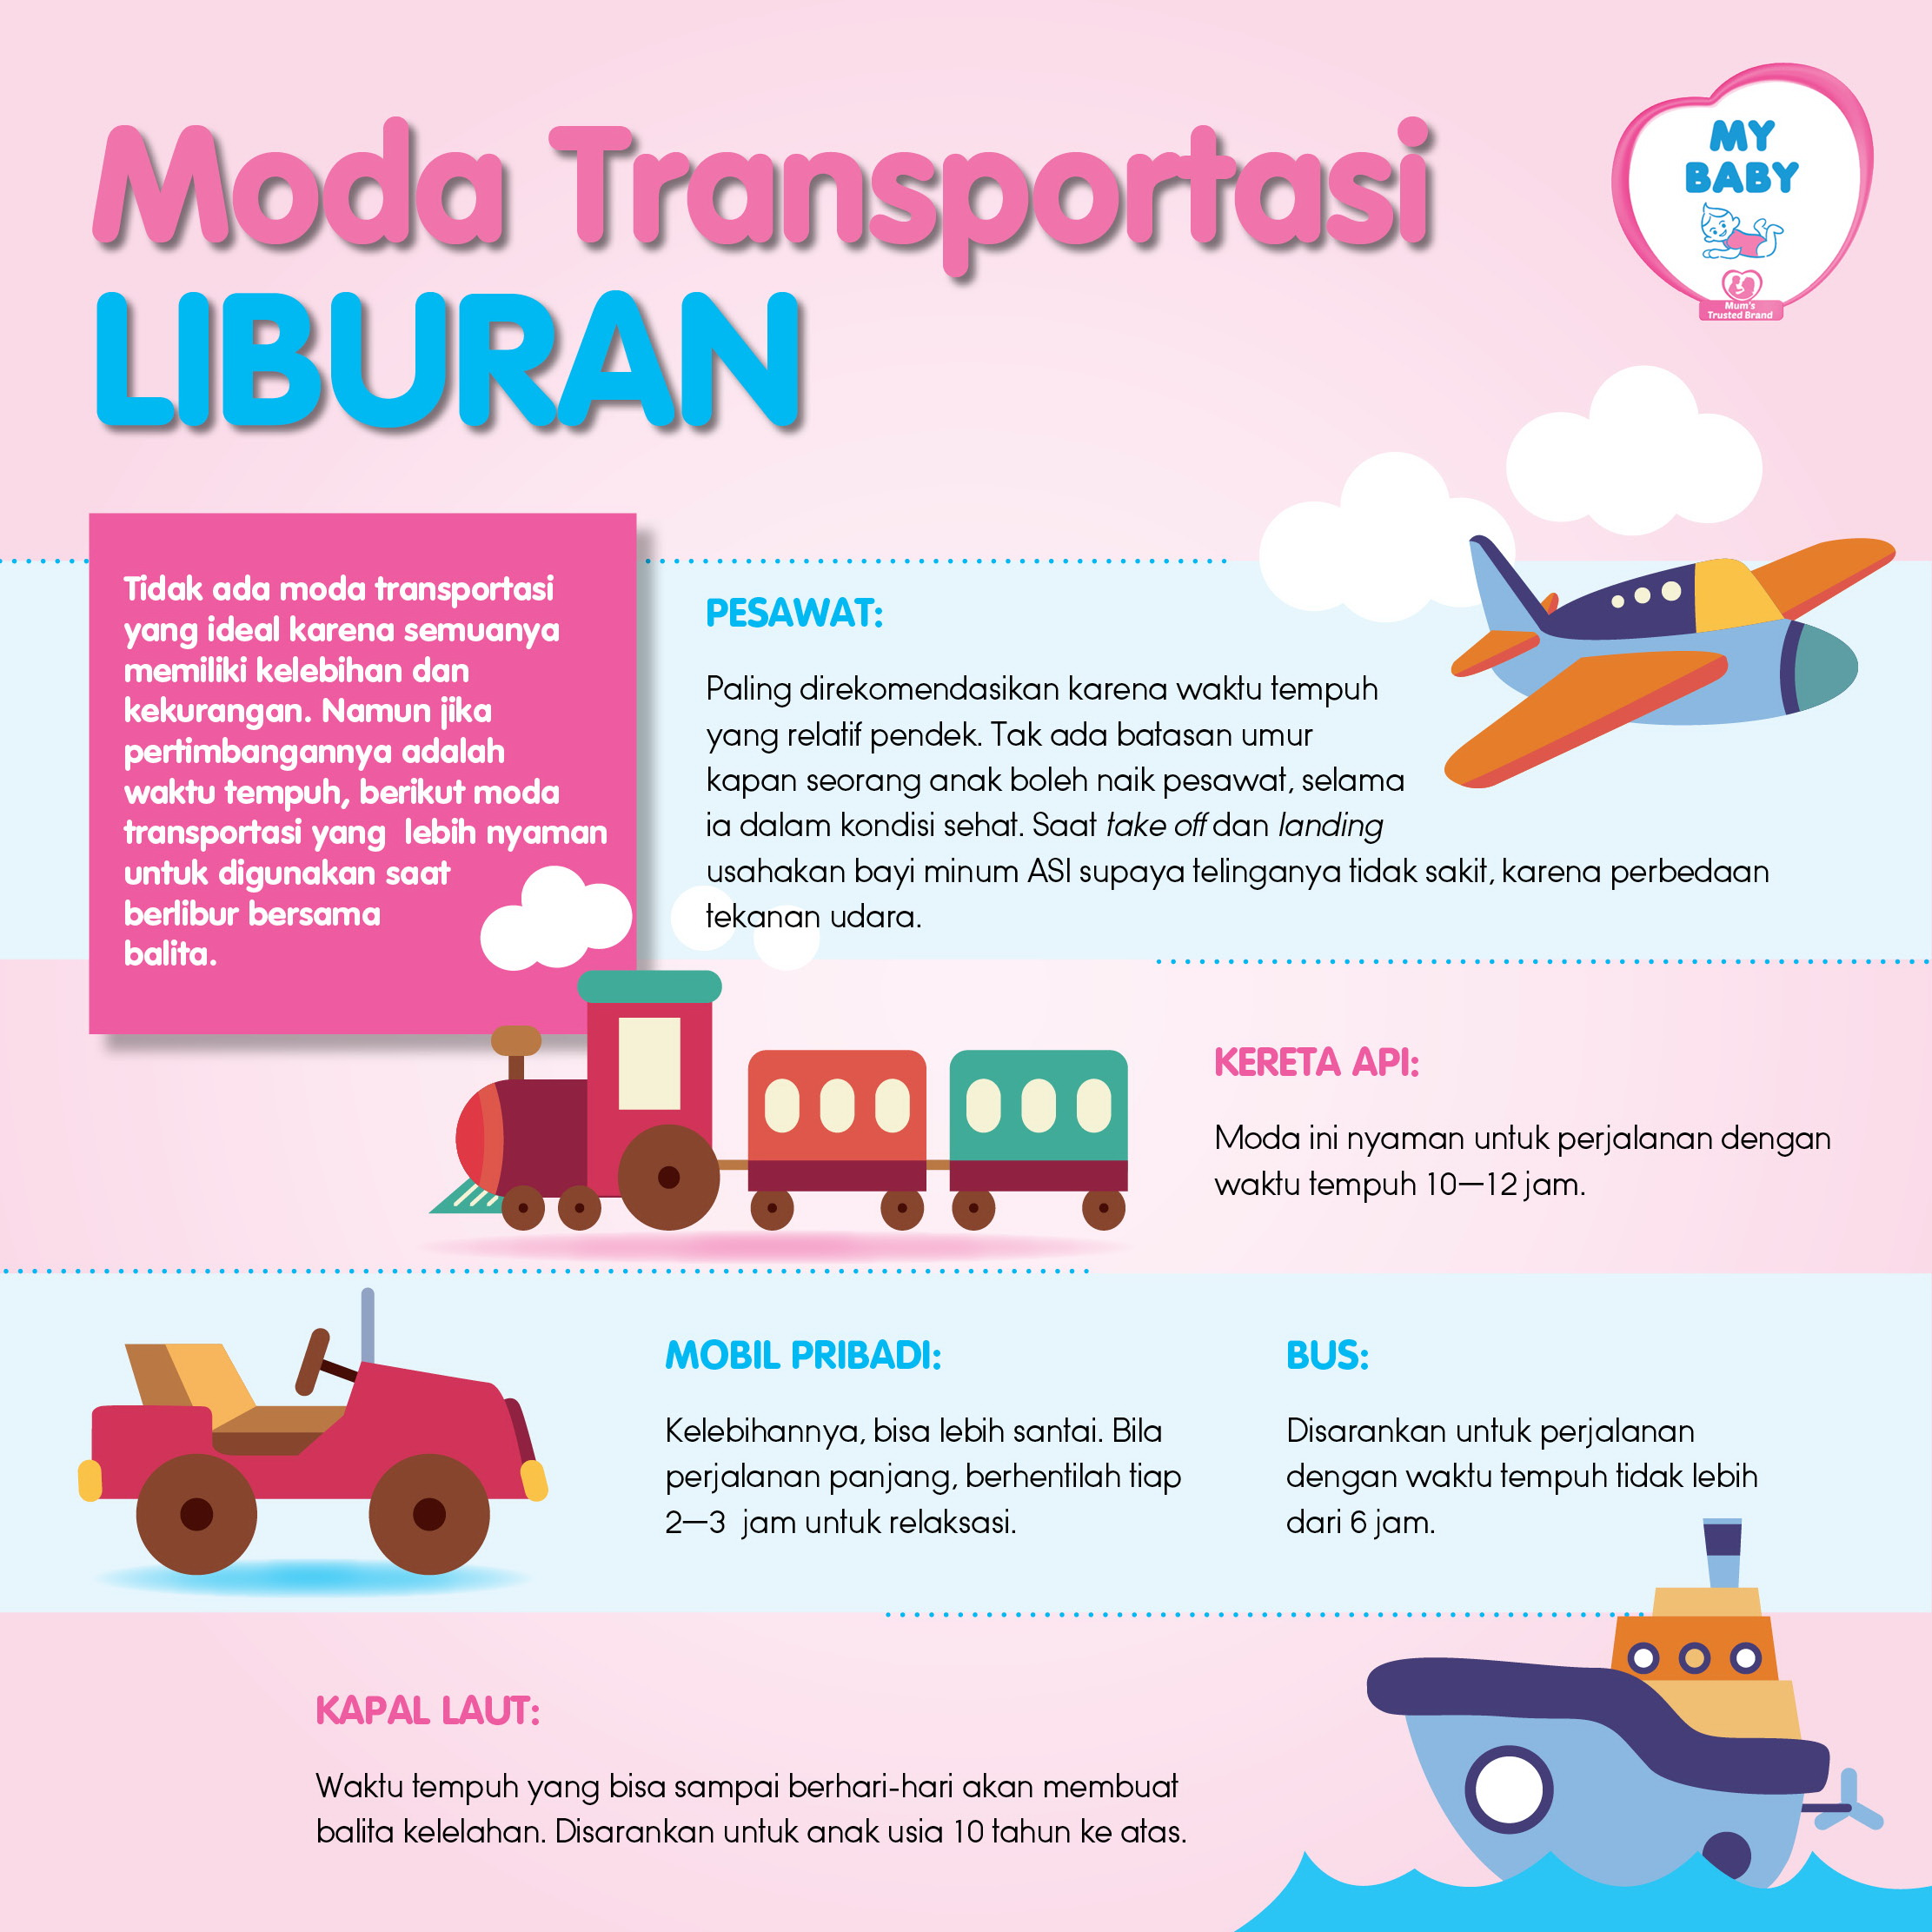 Moda Transportasi Liburan